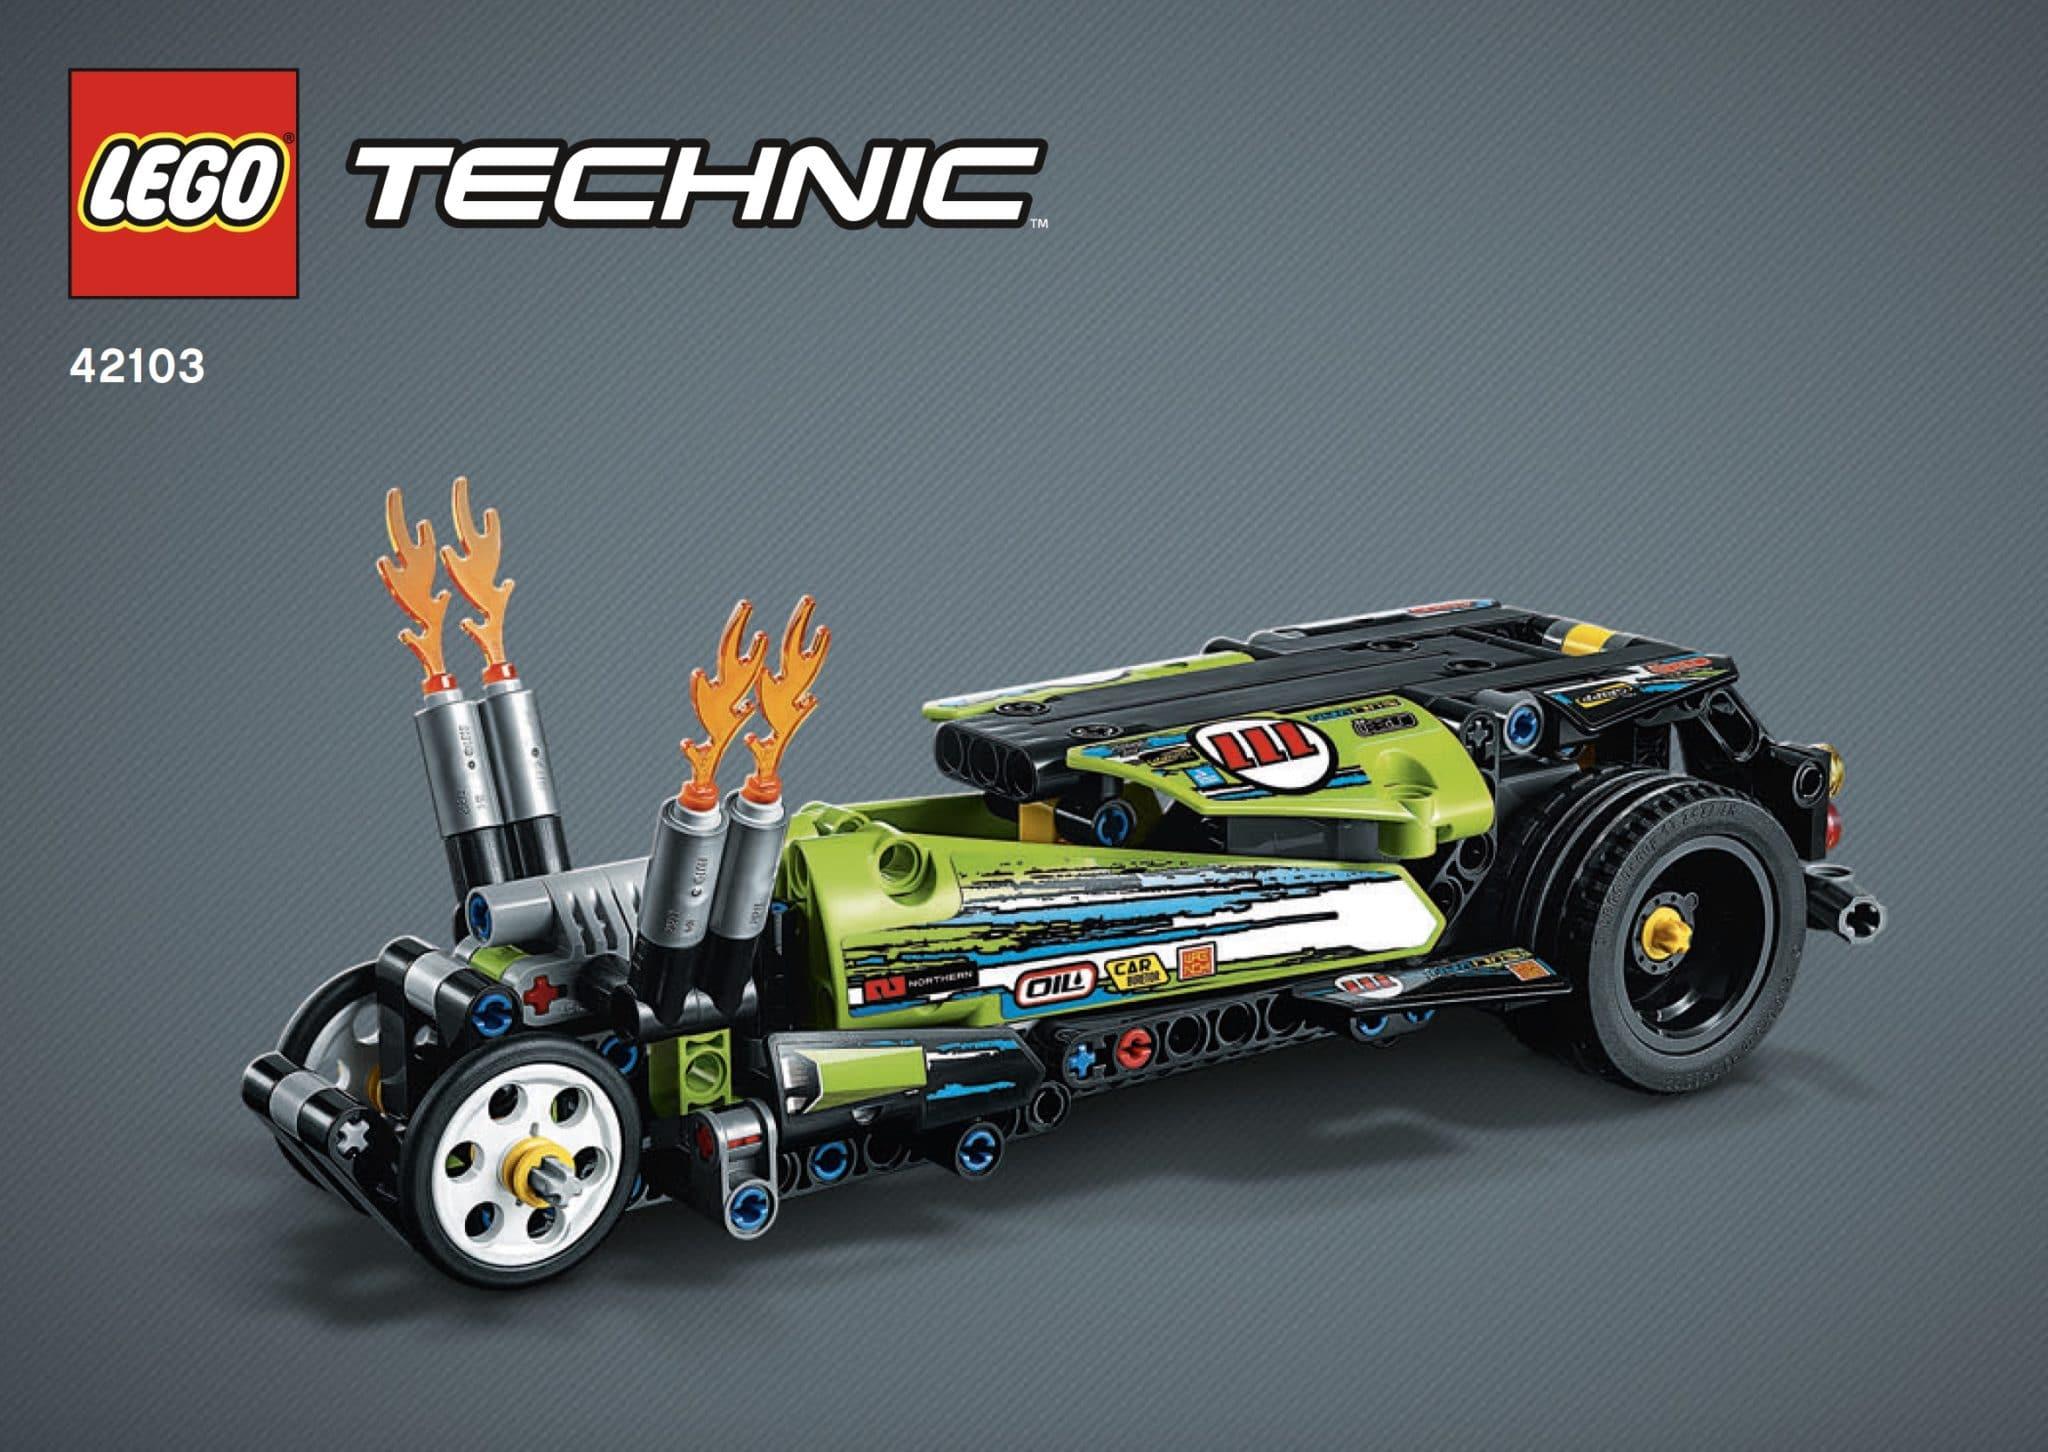 LEGO Technic 42103 B-Modell